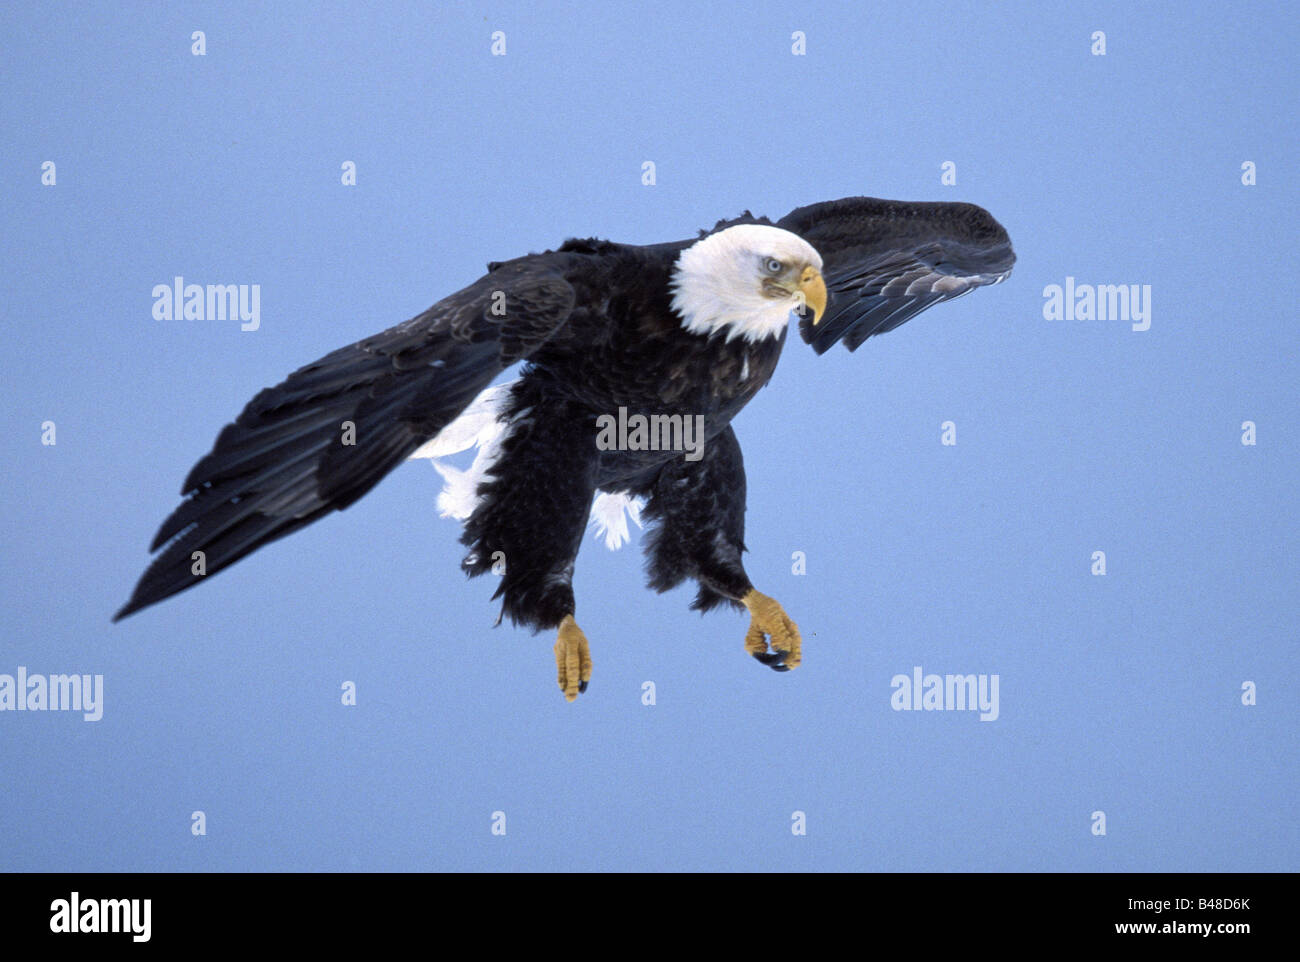 zoology / animals, avian / bird, Accipitridae, Bald Eagle (Haliaeetus leucocephalus), flying, Homer, Alaska, USA, - Stock Image